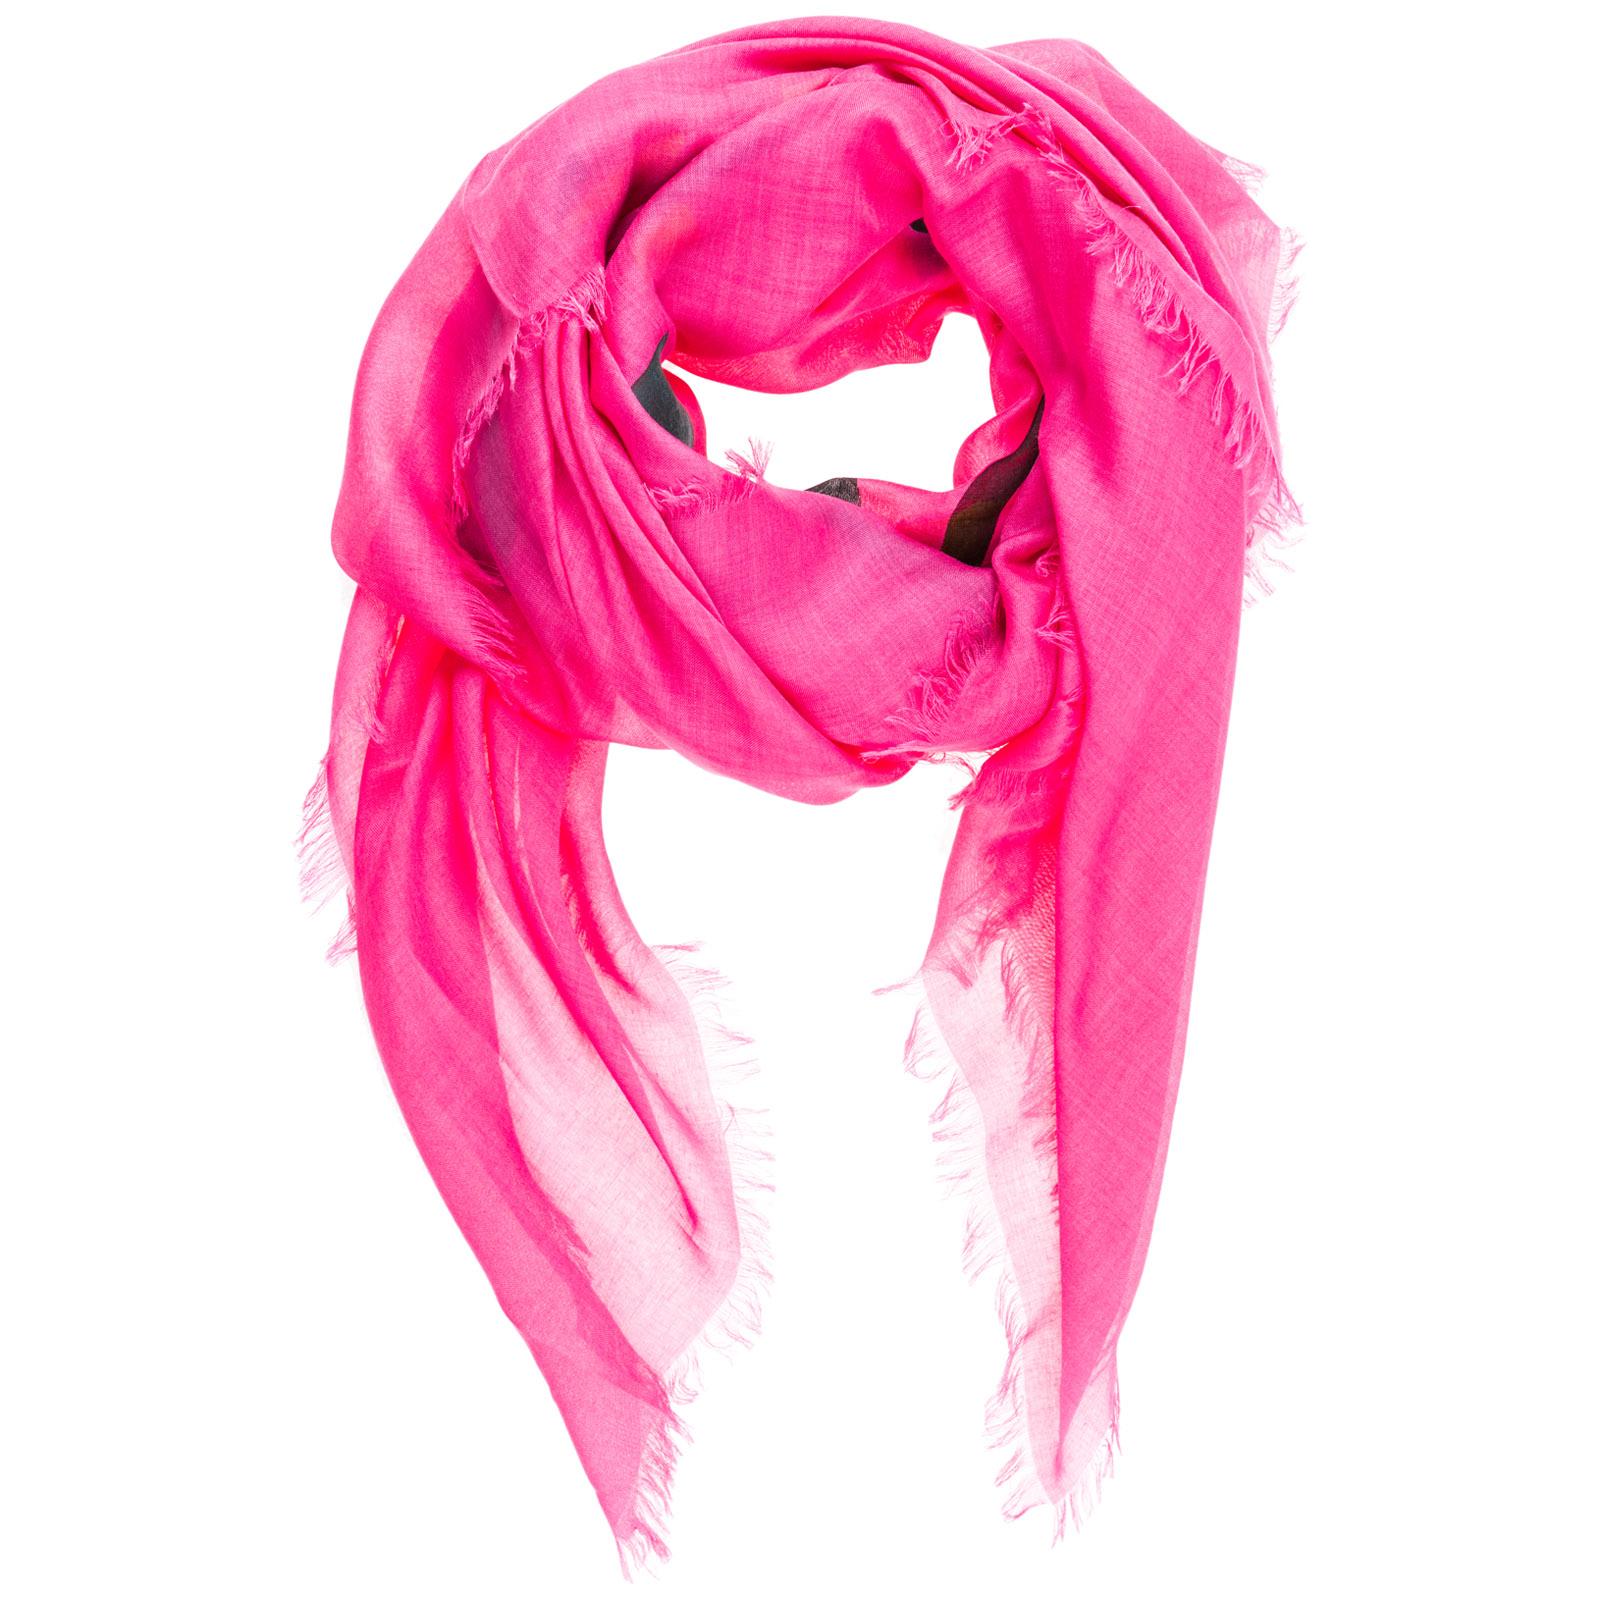 Women's shawl shoulder wrap